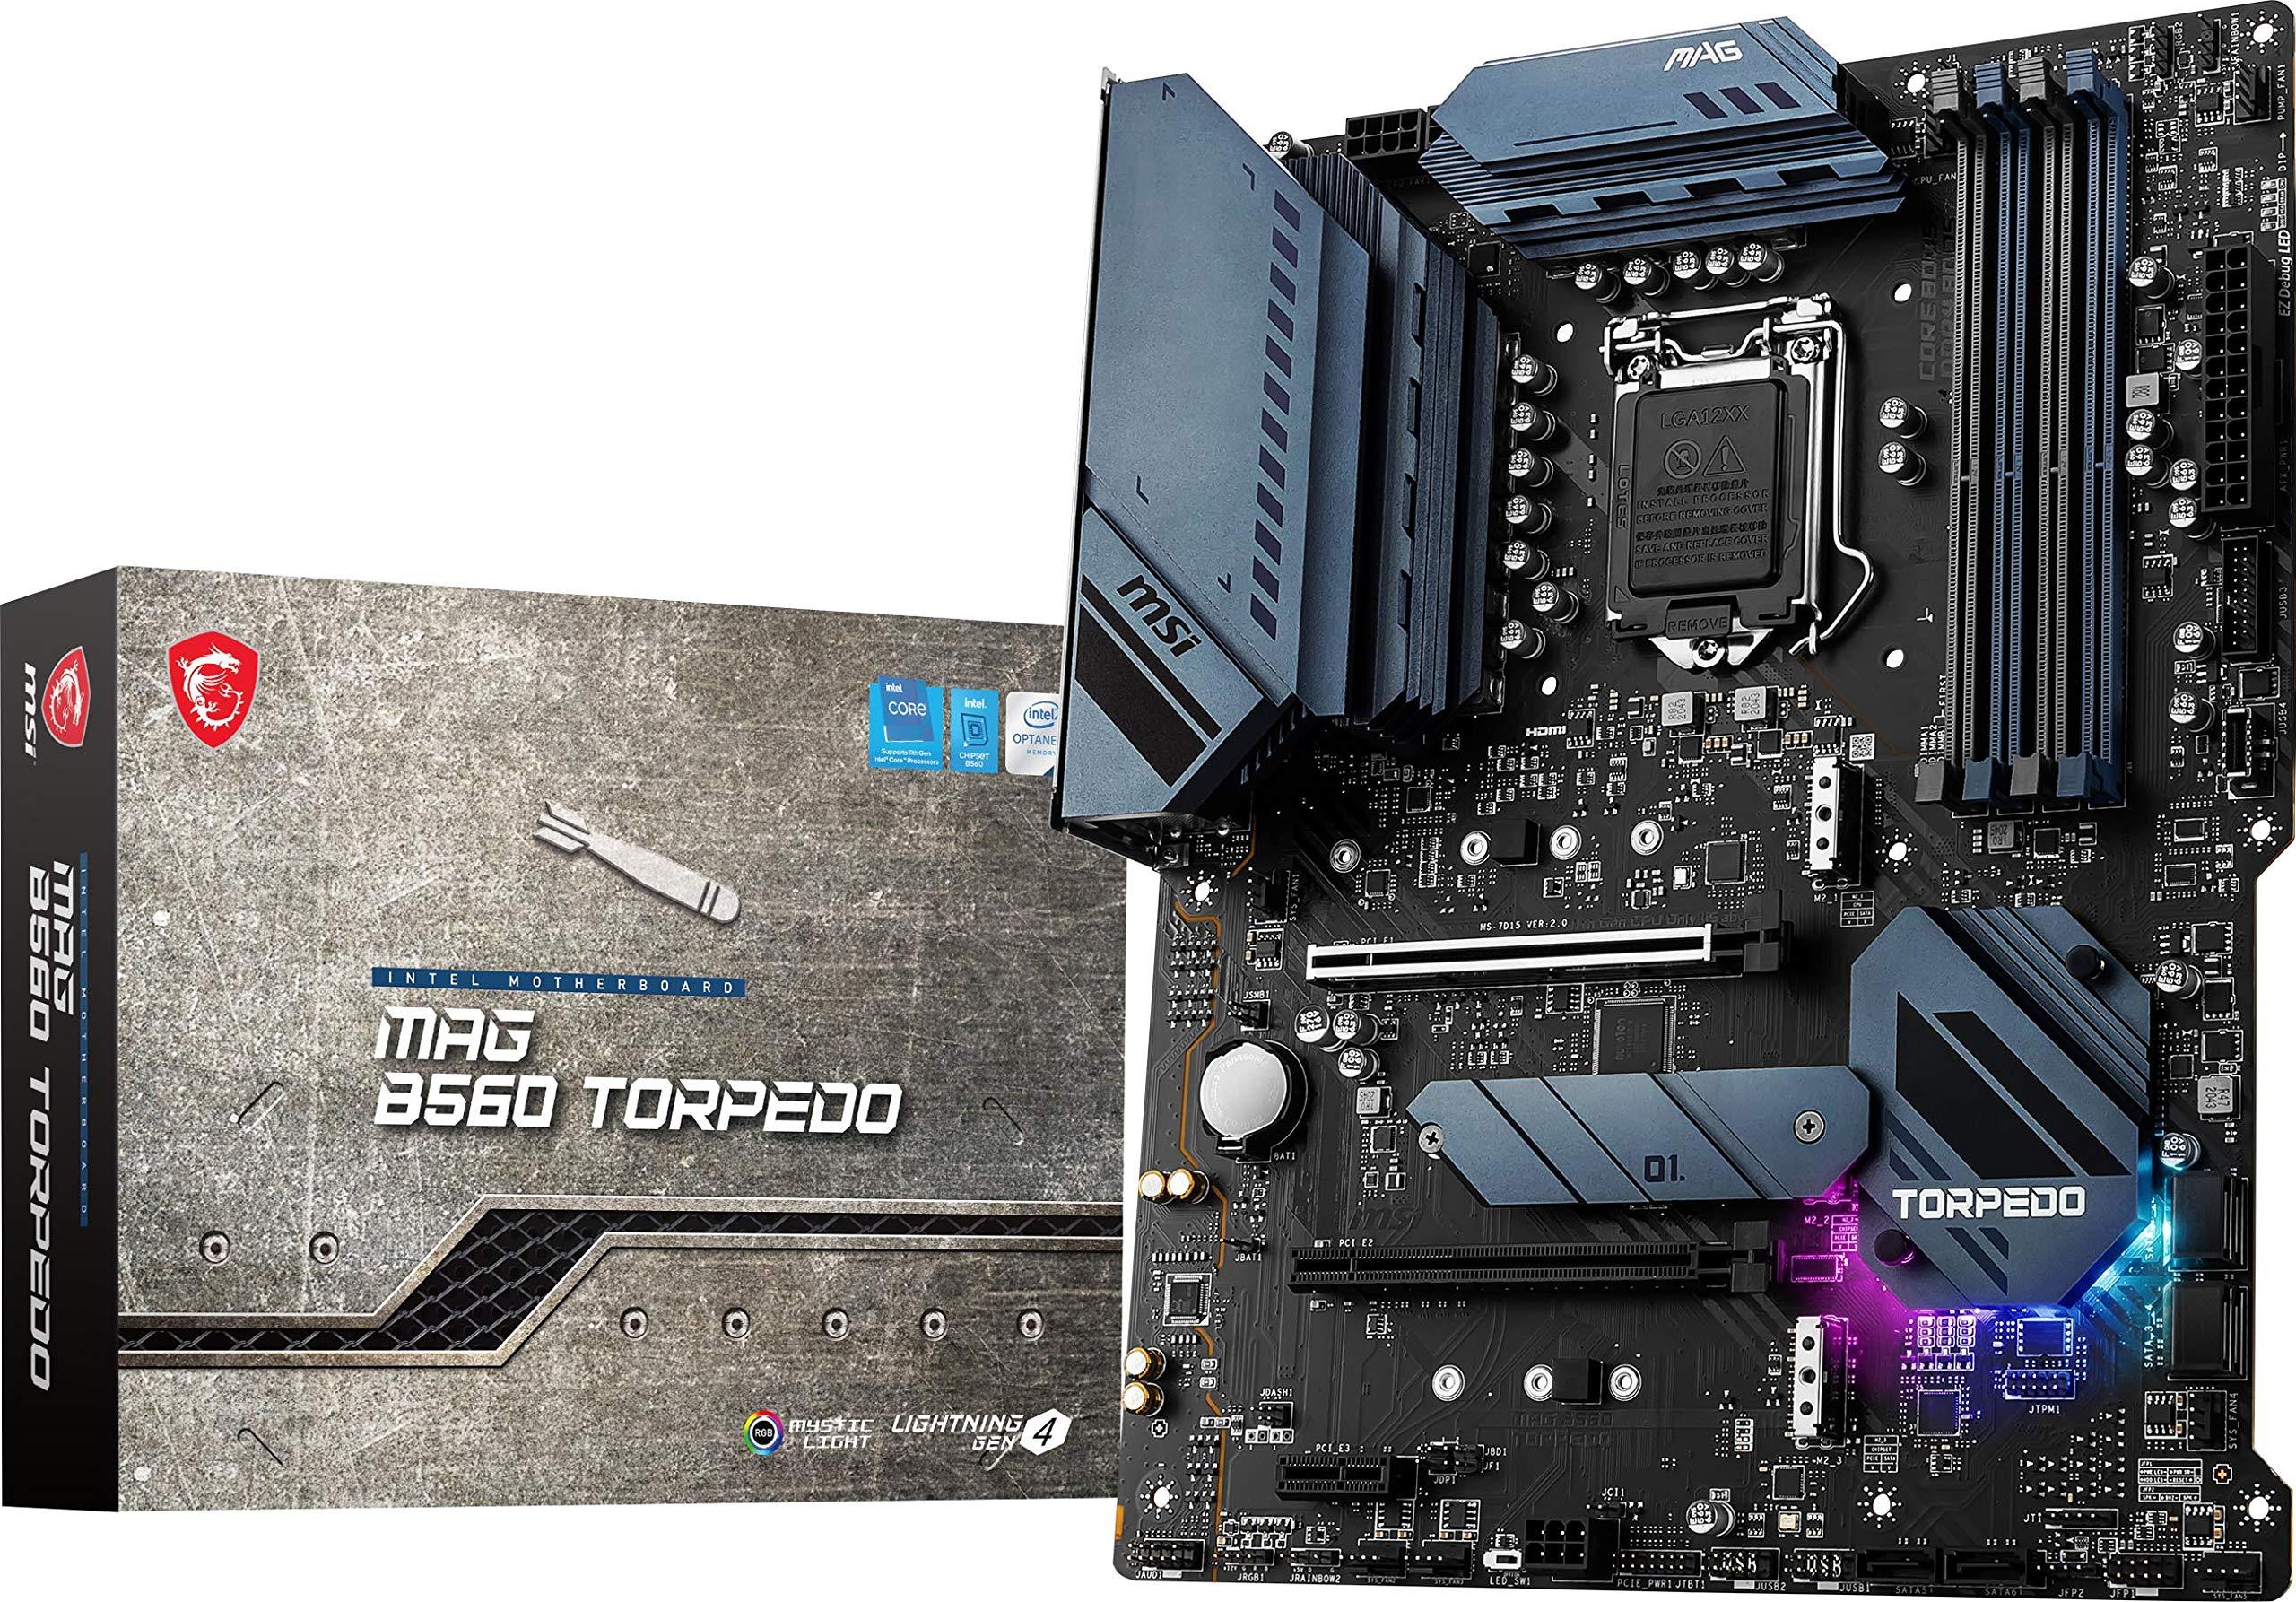 MAG B560 Torpedo (ATX, 11th/10th Gen Intel Core, LGA 1200 So